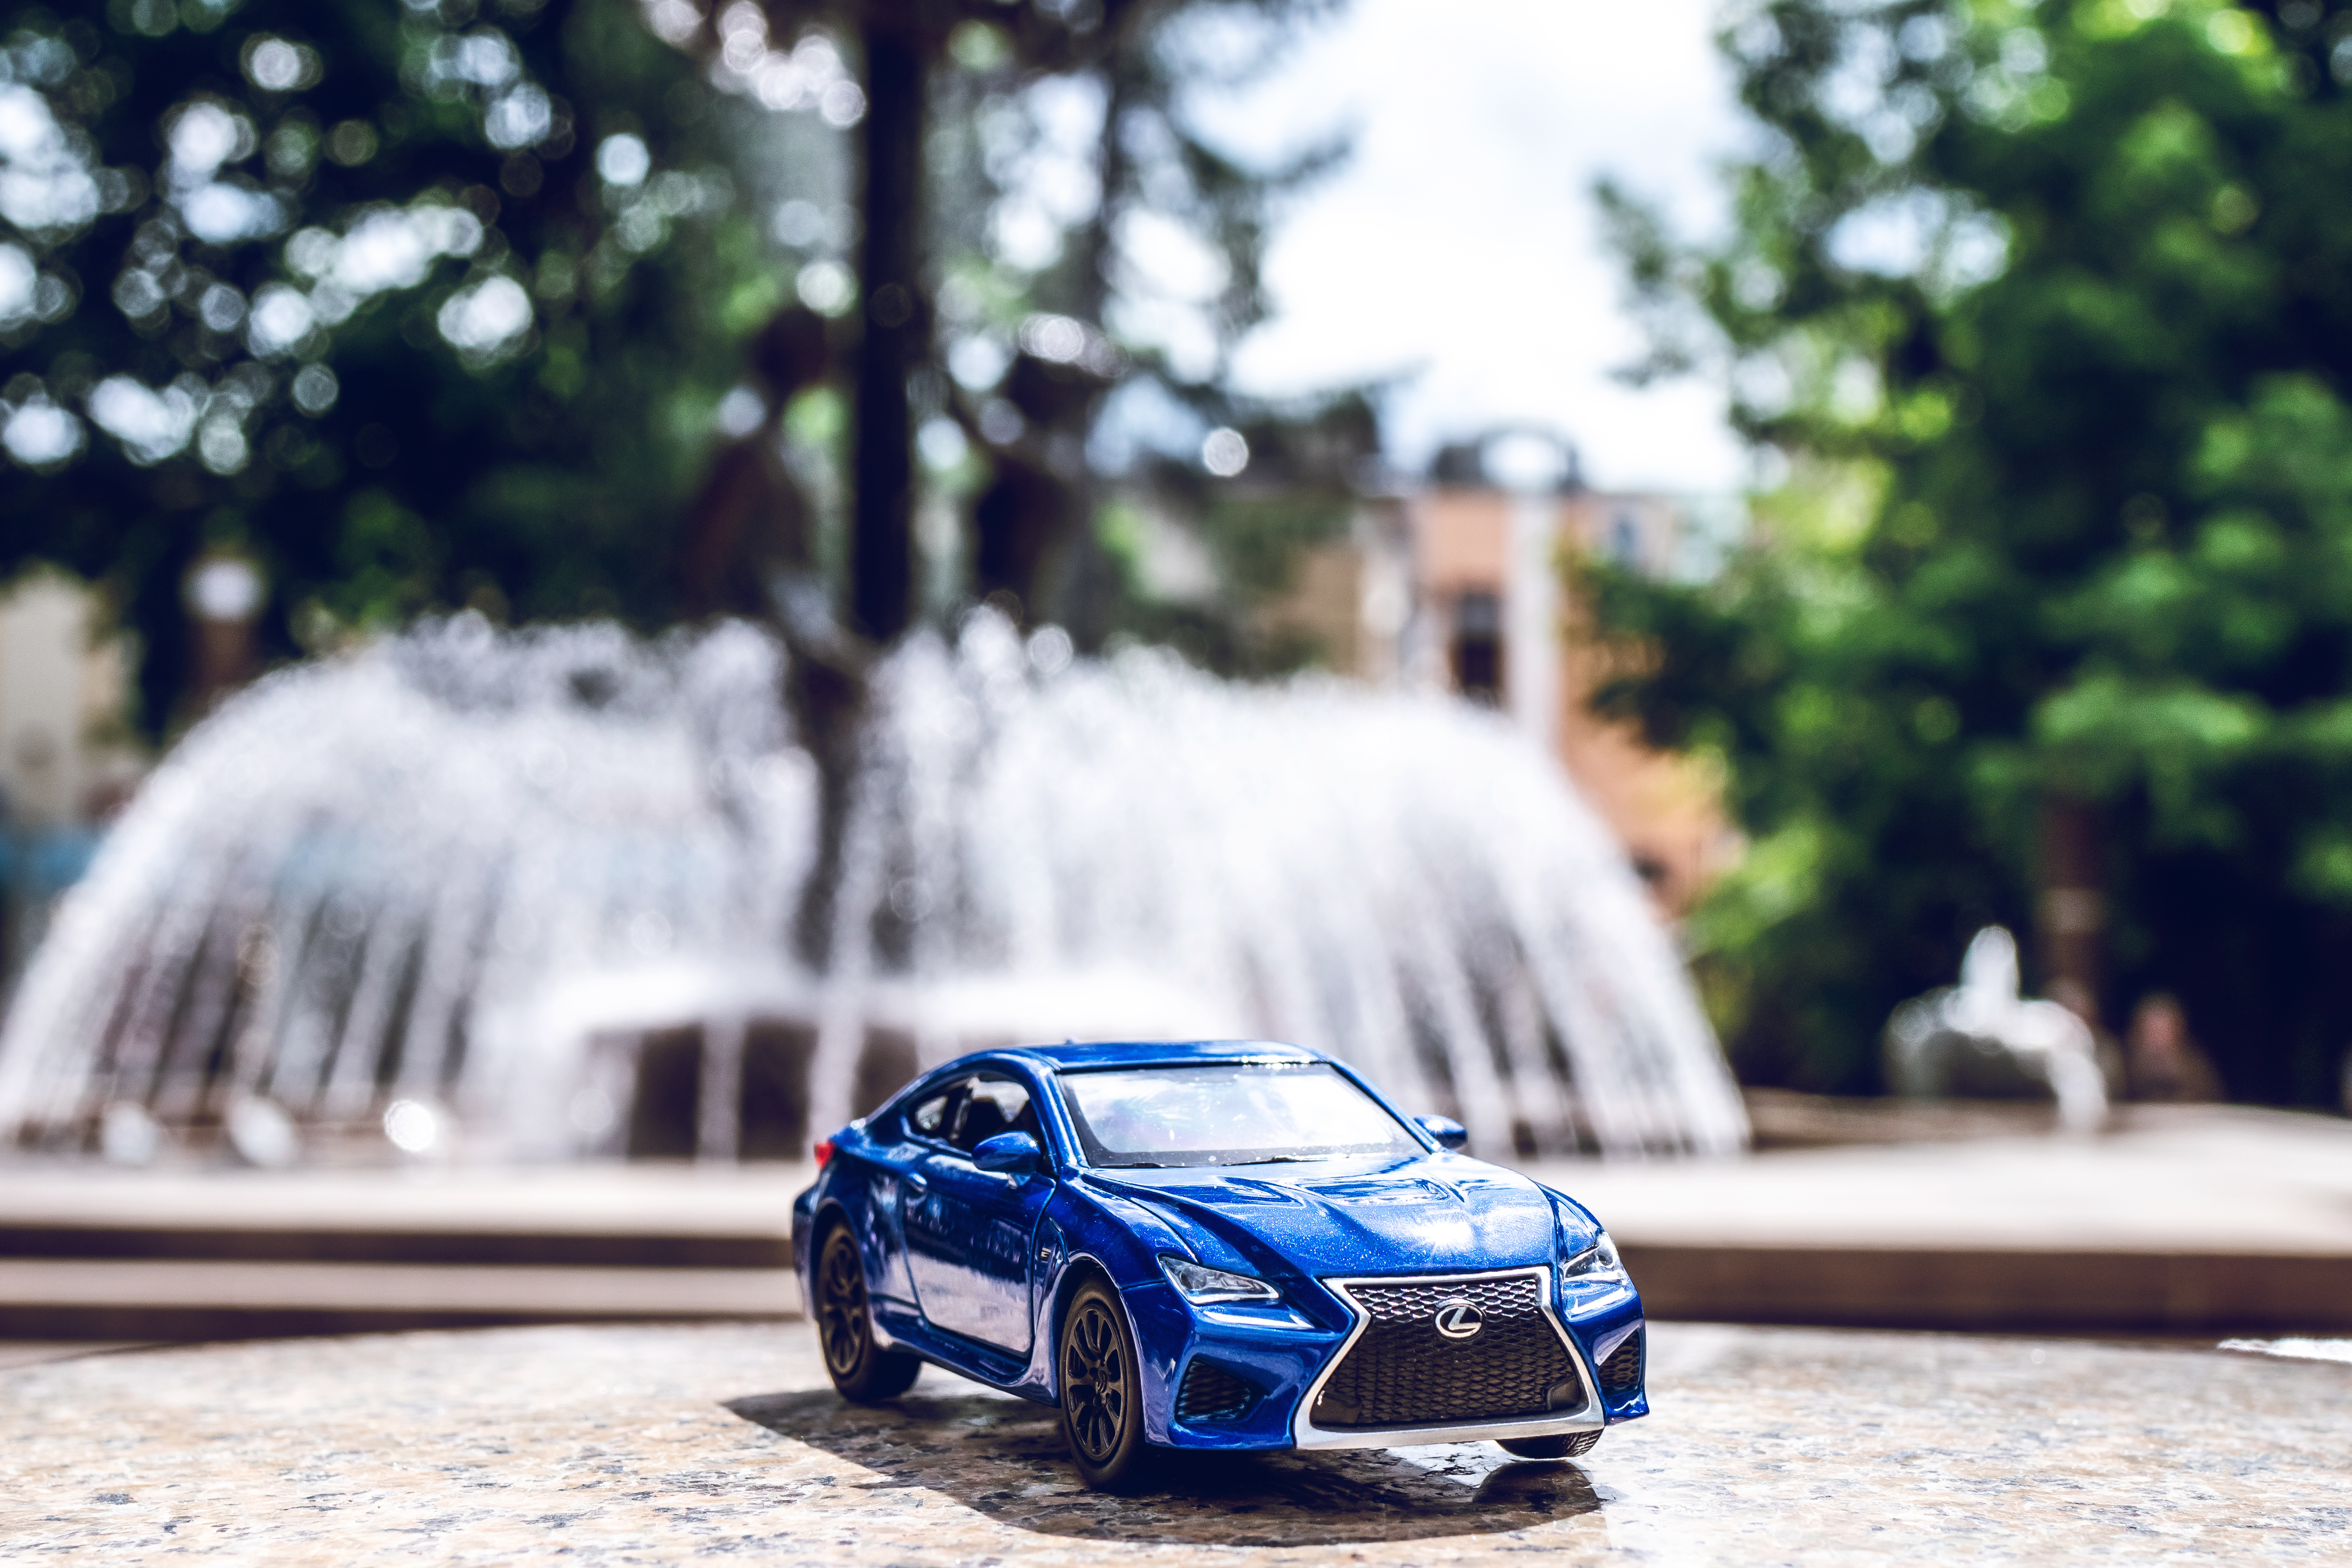 Blue Die-cast Toy Car Across Outdoor Fountain